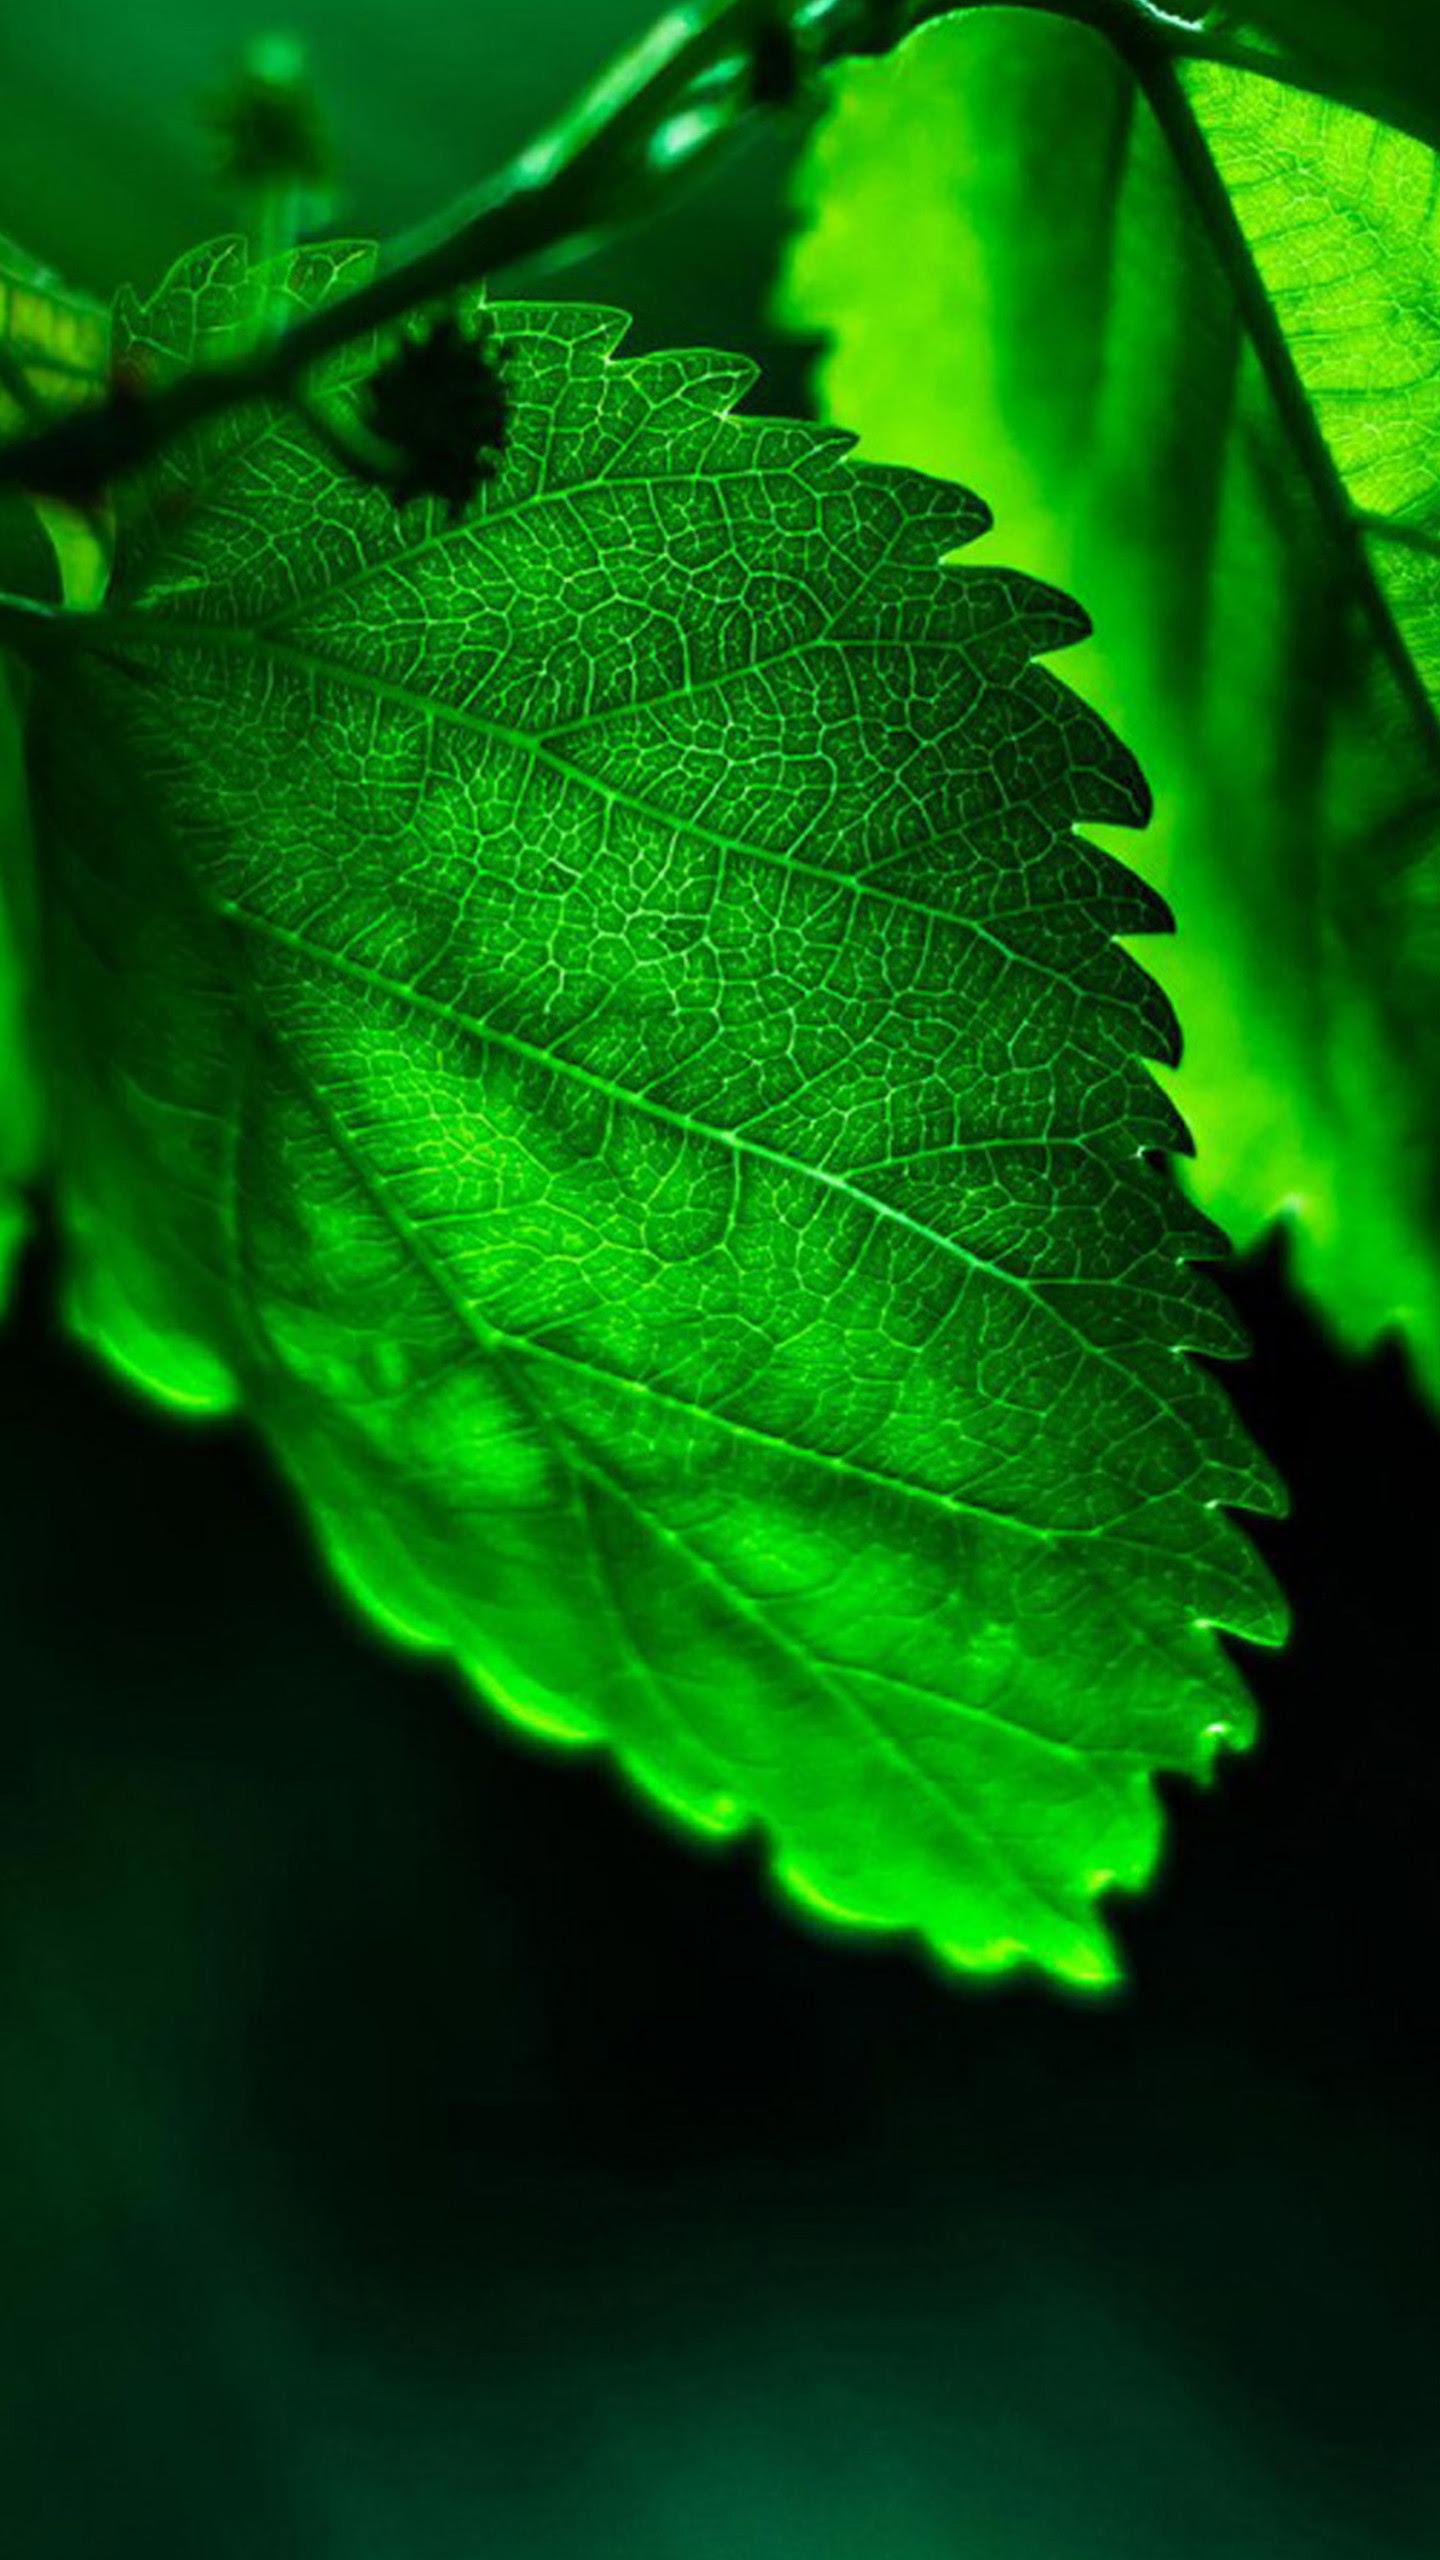 Green Leaf Wallpaper HD (70+ images)